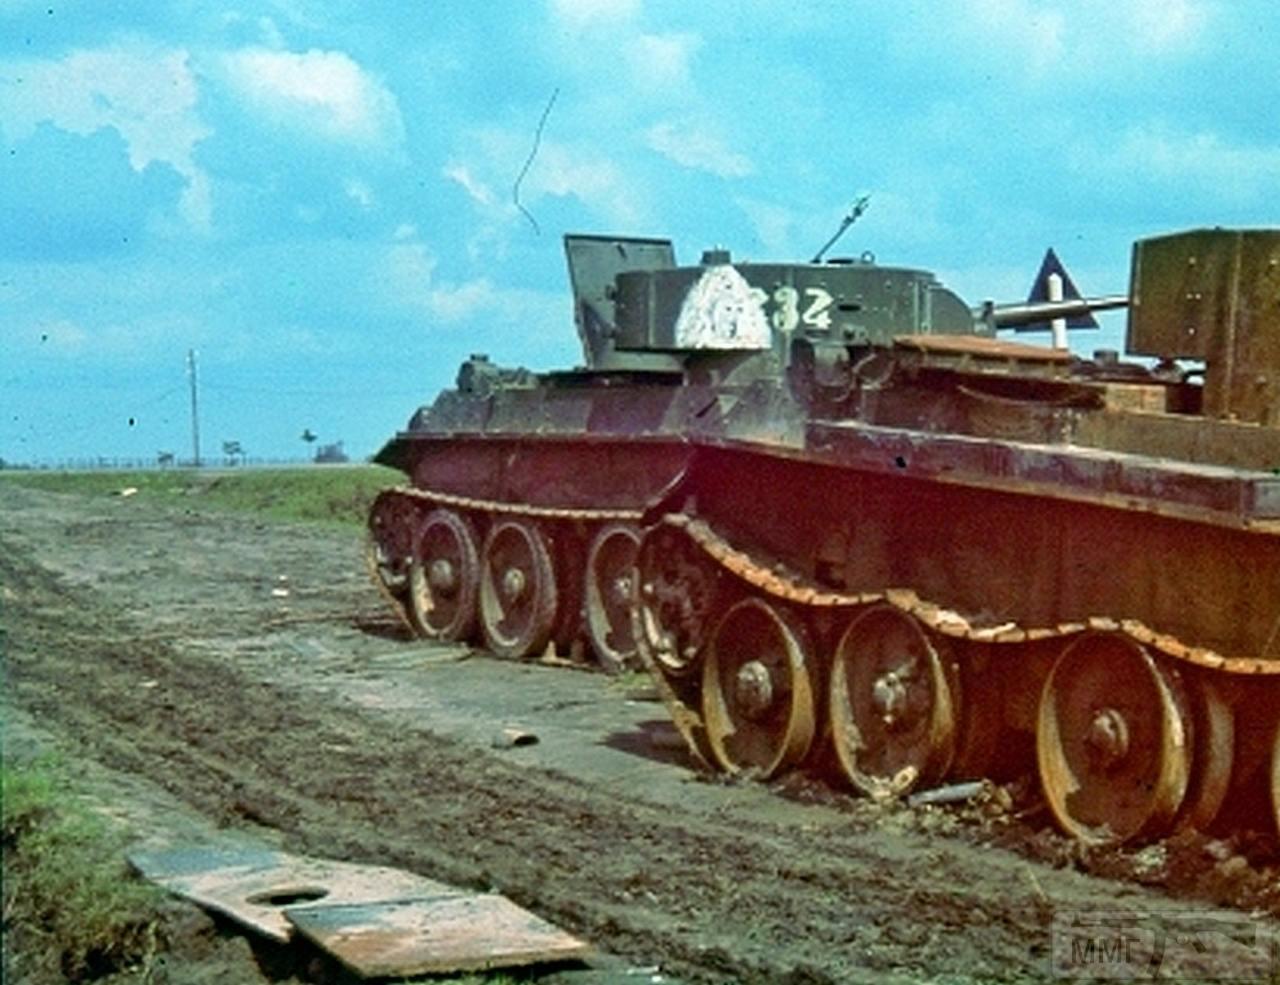 77440 - Лето 1941г,немецкие фото.